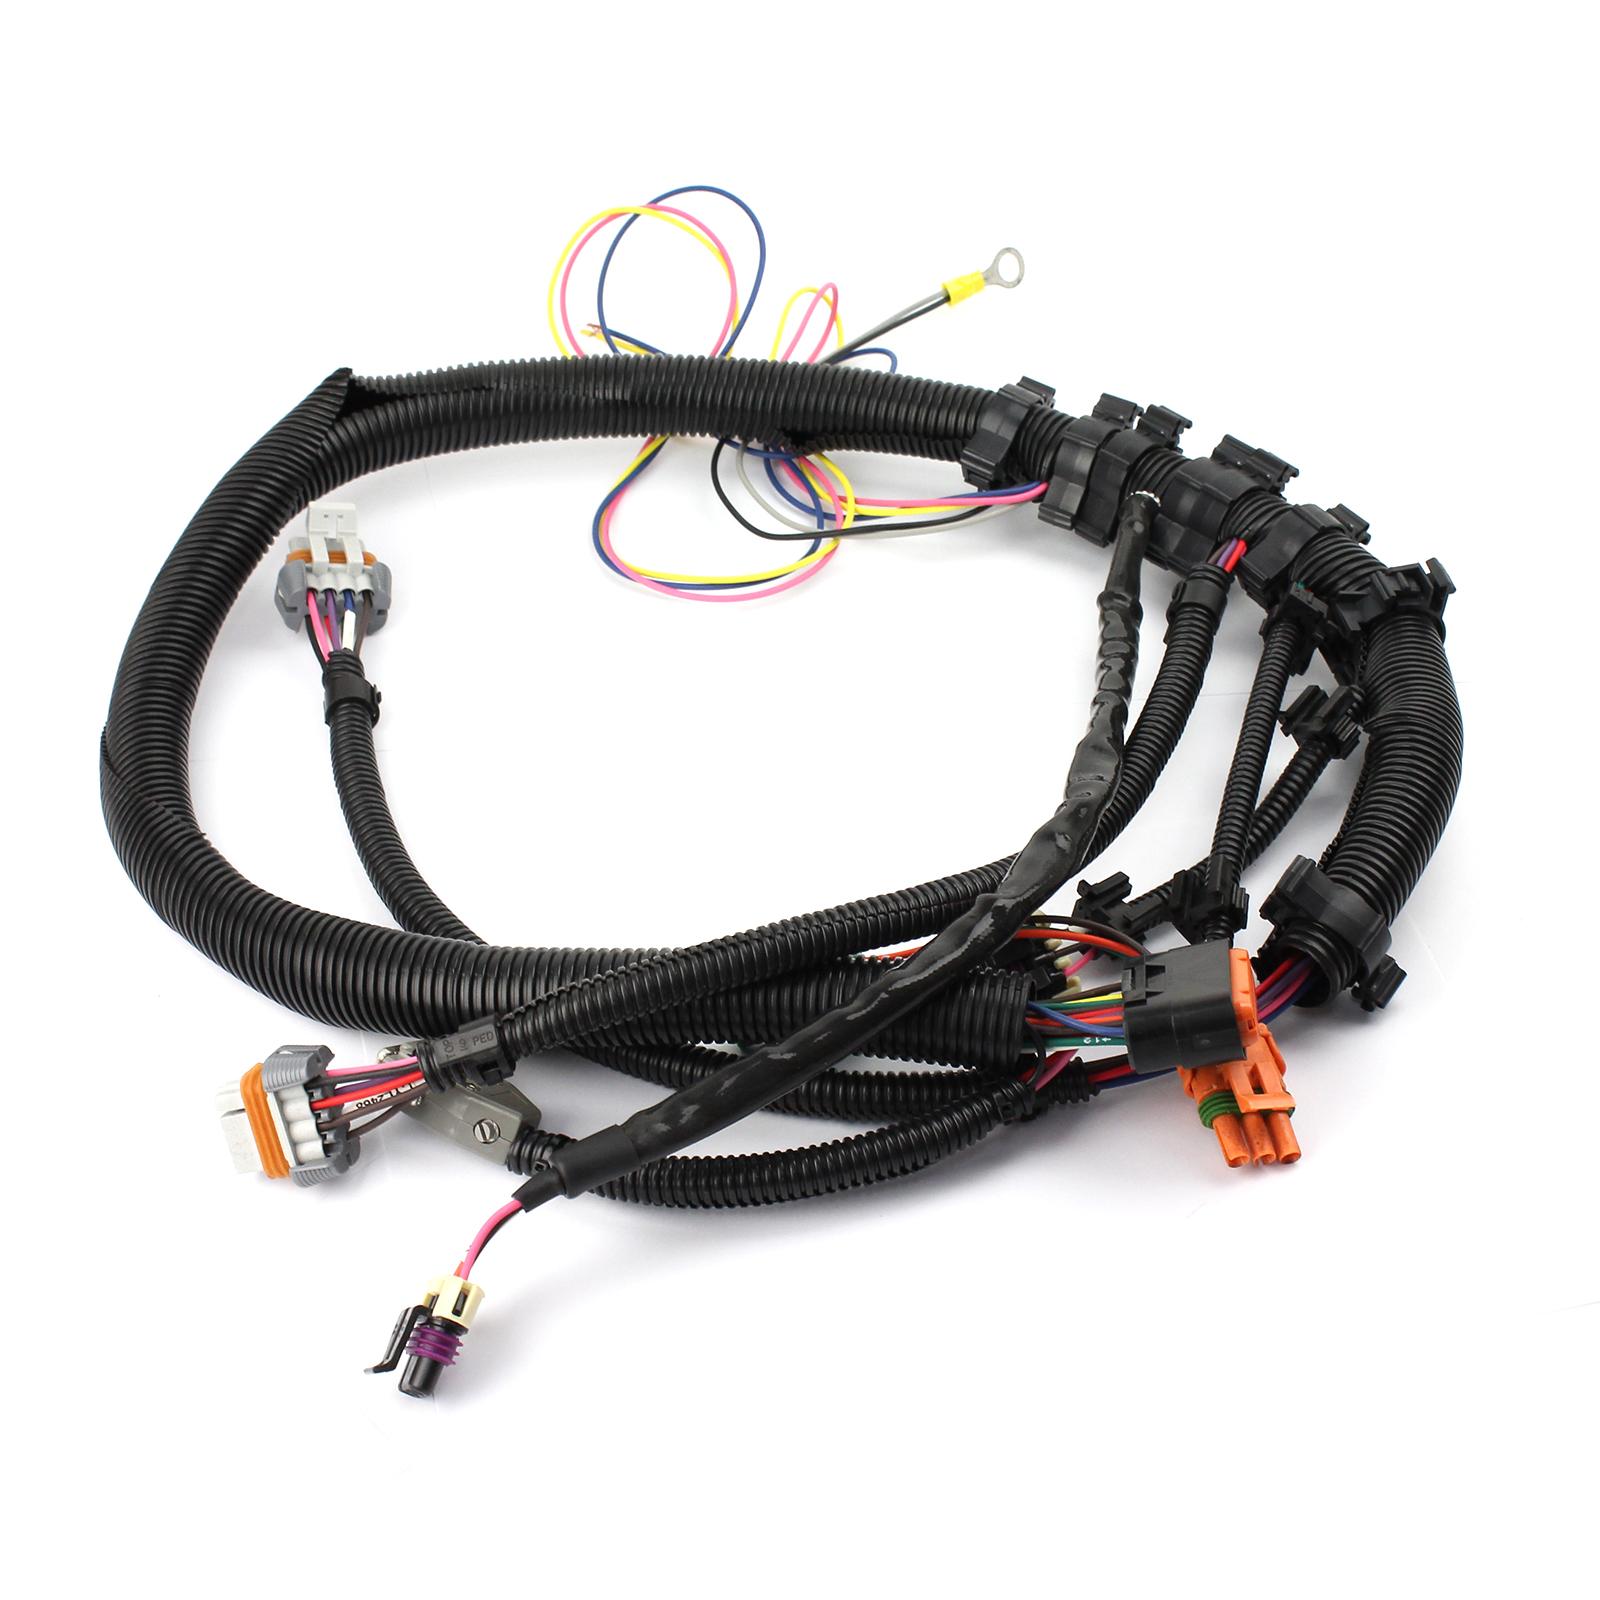 hight resolution of gm ls1 ls6 24 tooth black crank sensor wiring harness intake manifold mount